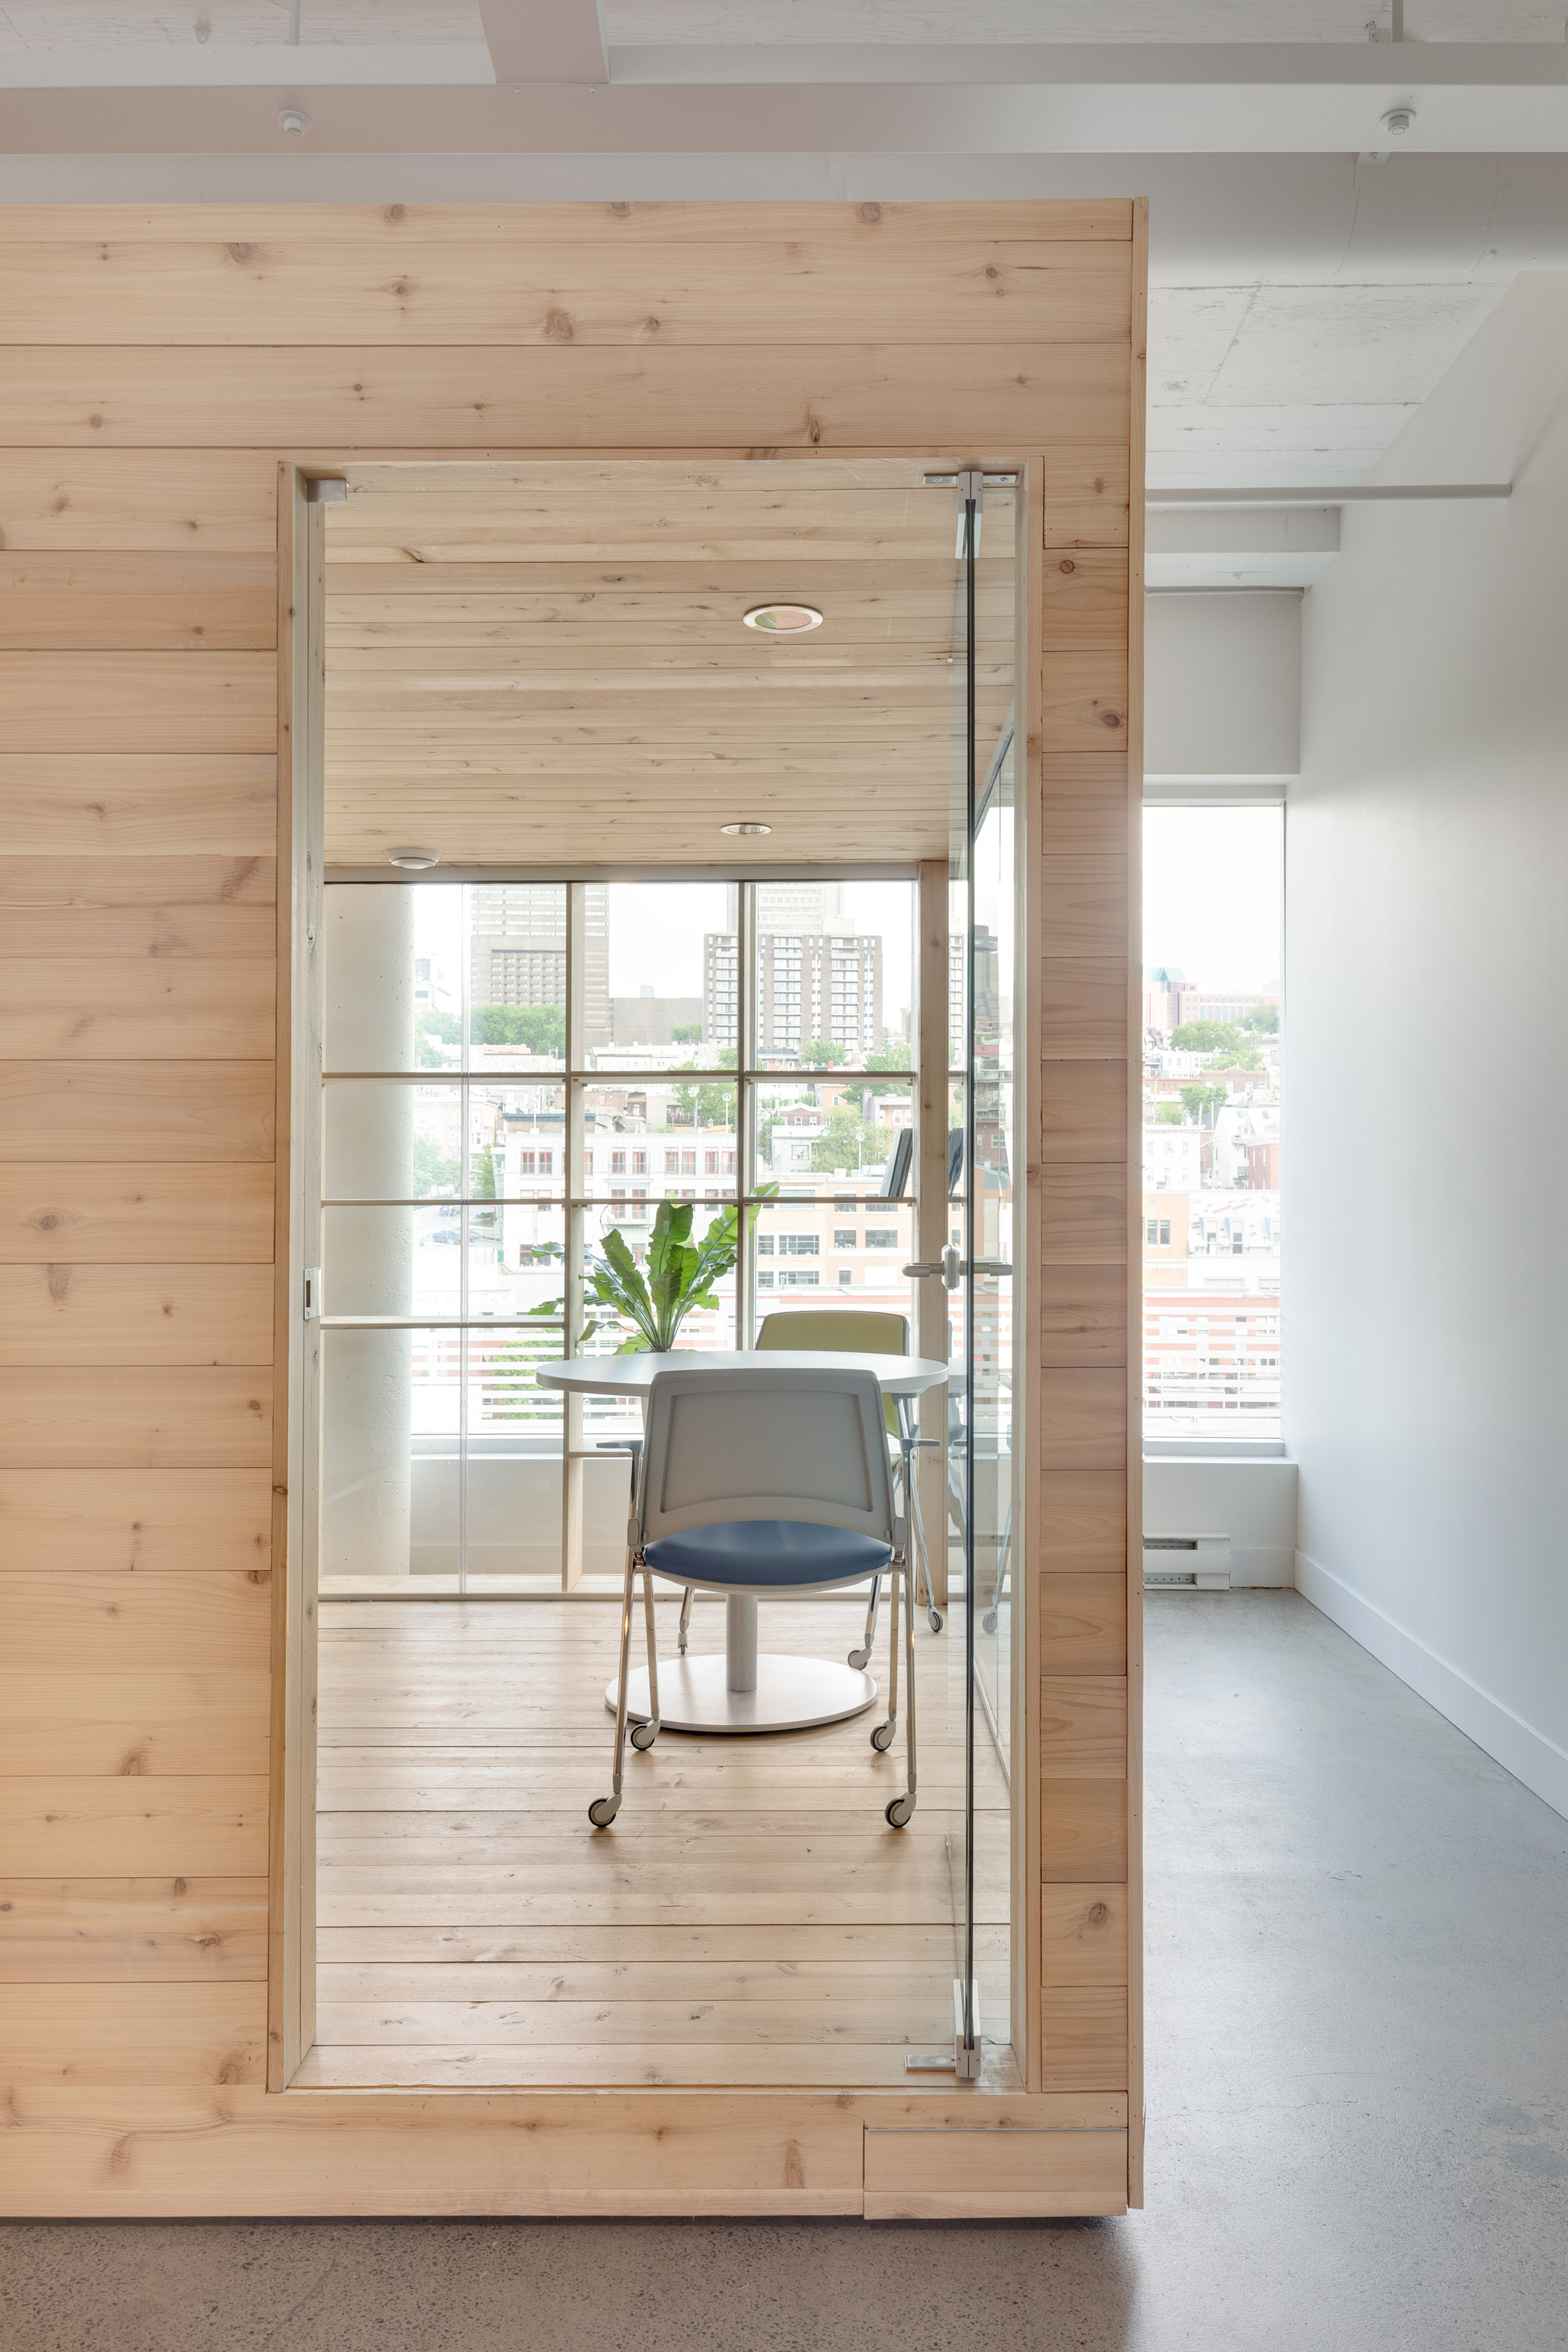 bureaux-ovh-atelier-pierret-thibault-interiors-offices-canada_dezeen_2364_col_6.jpg